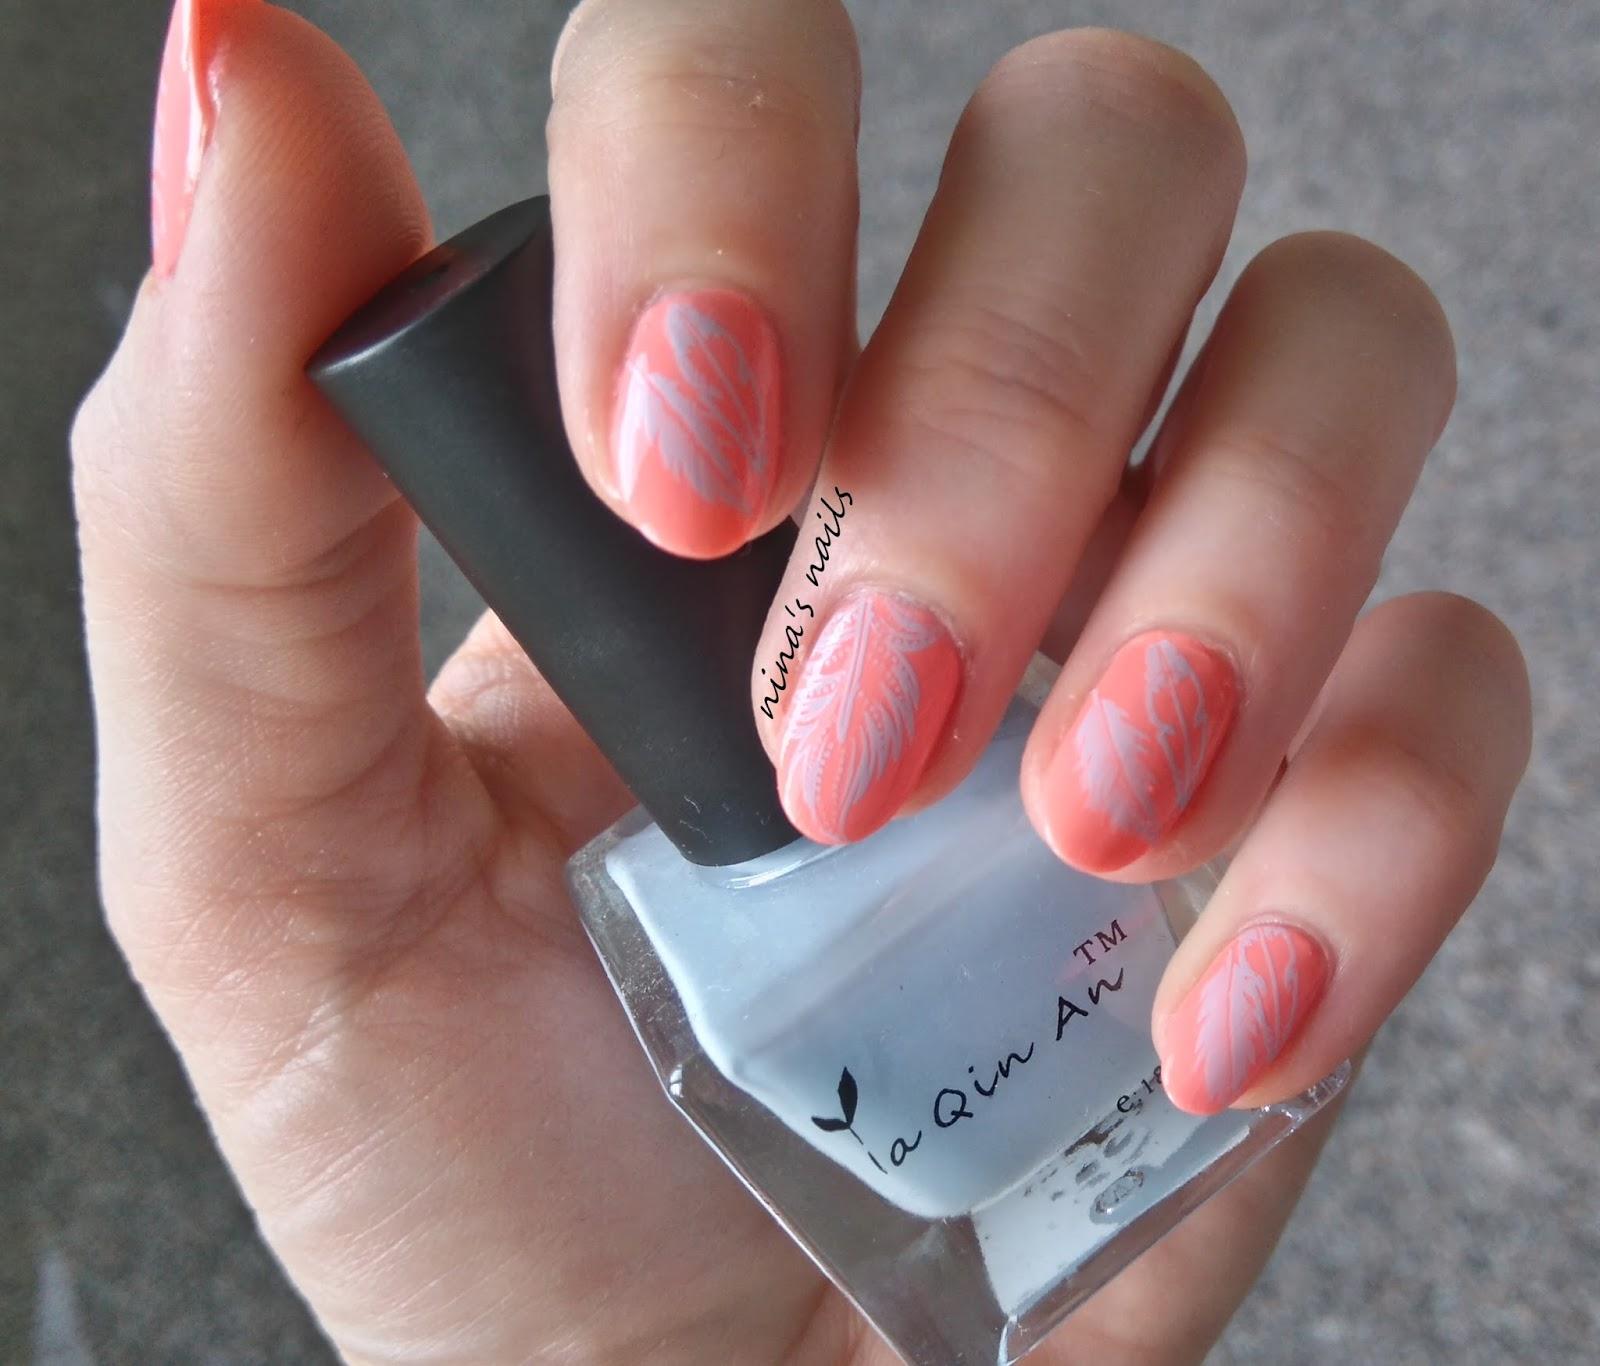 Nina Nina Ricci perfume - a fragrance for women 2006